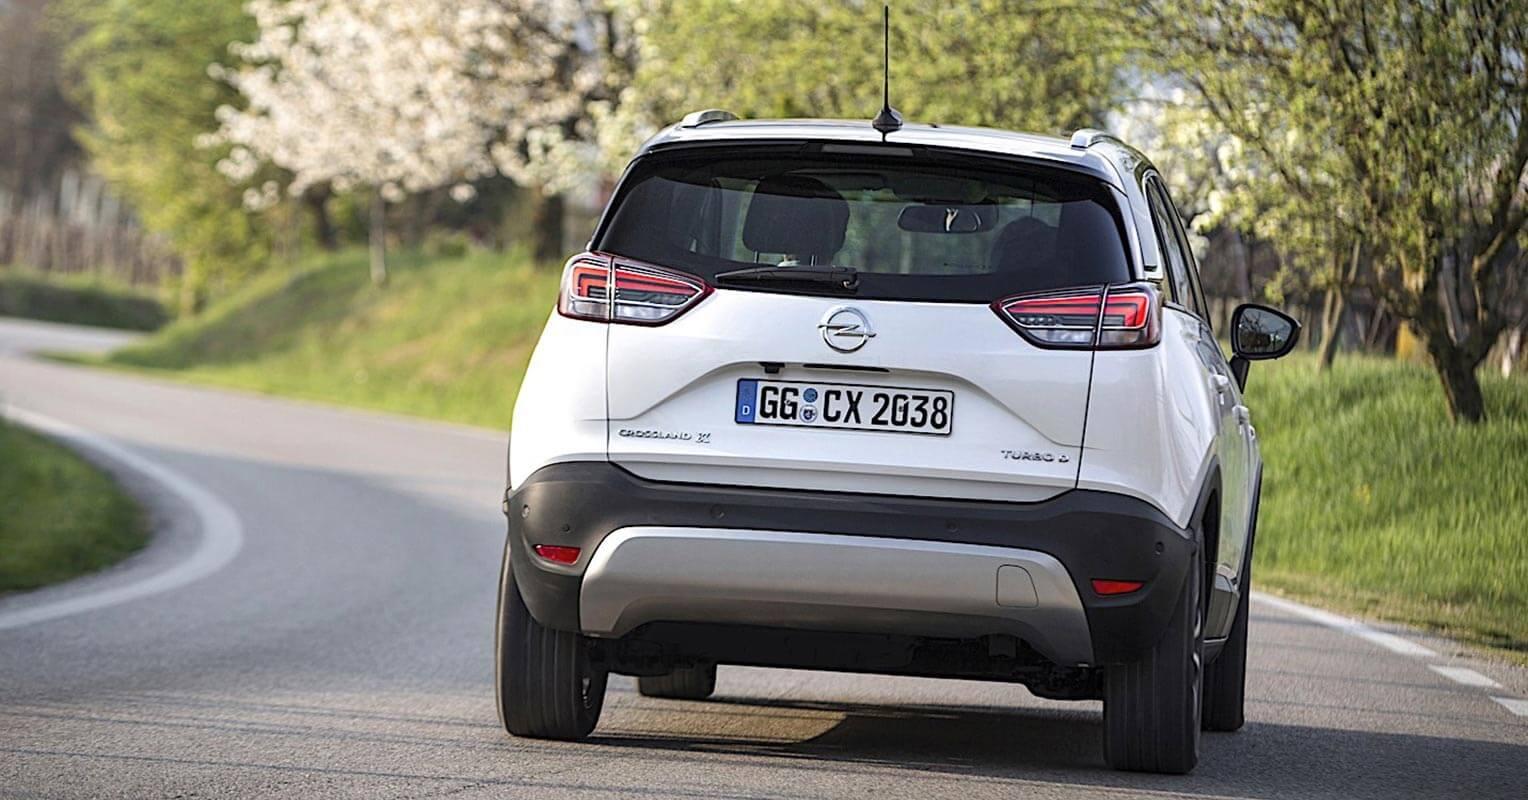 Trasera del Opel Crossland X 2018